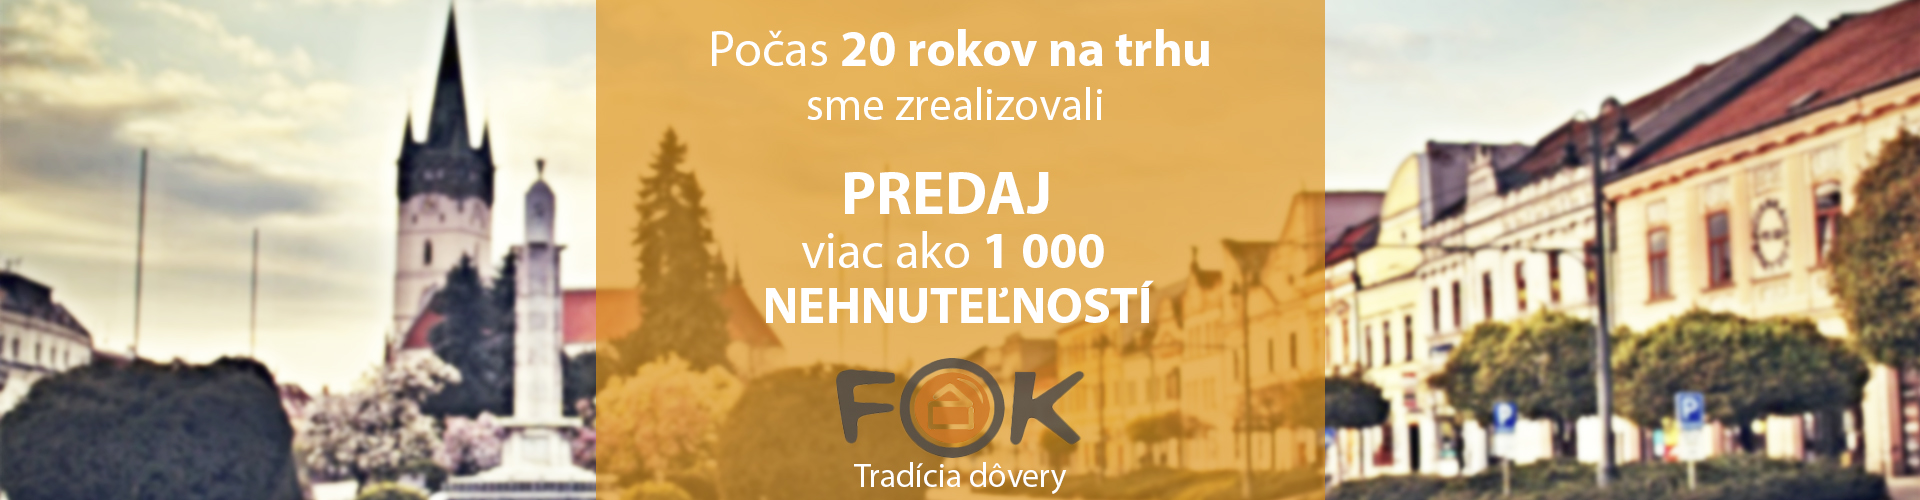 FOK_Reality